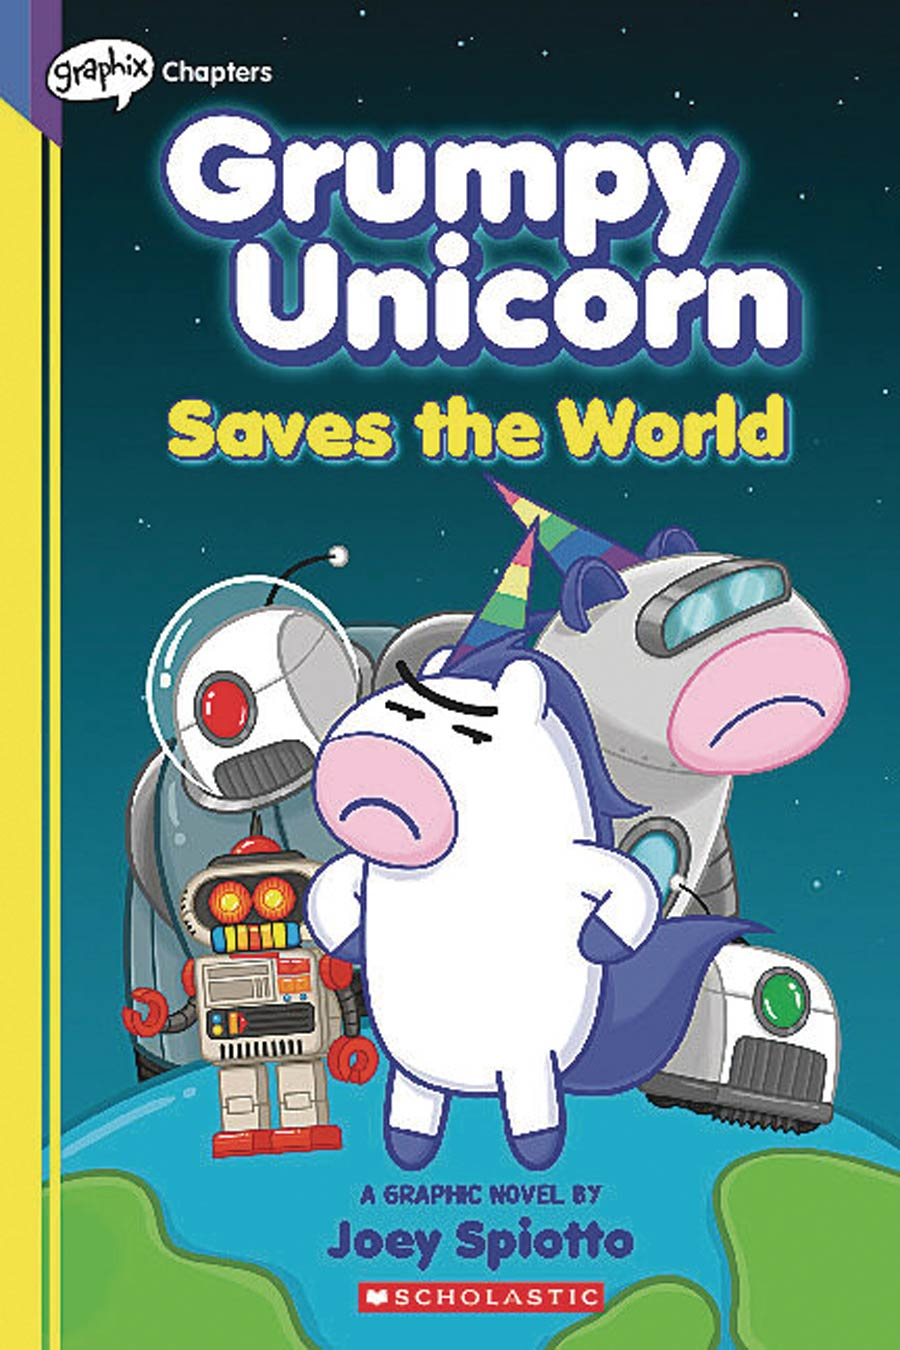 Grumpy Unicorn Vol 2 Grumpy Unicorn Saves The World TP